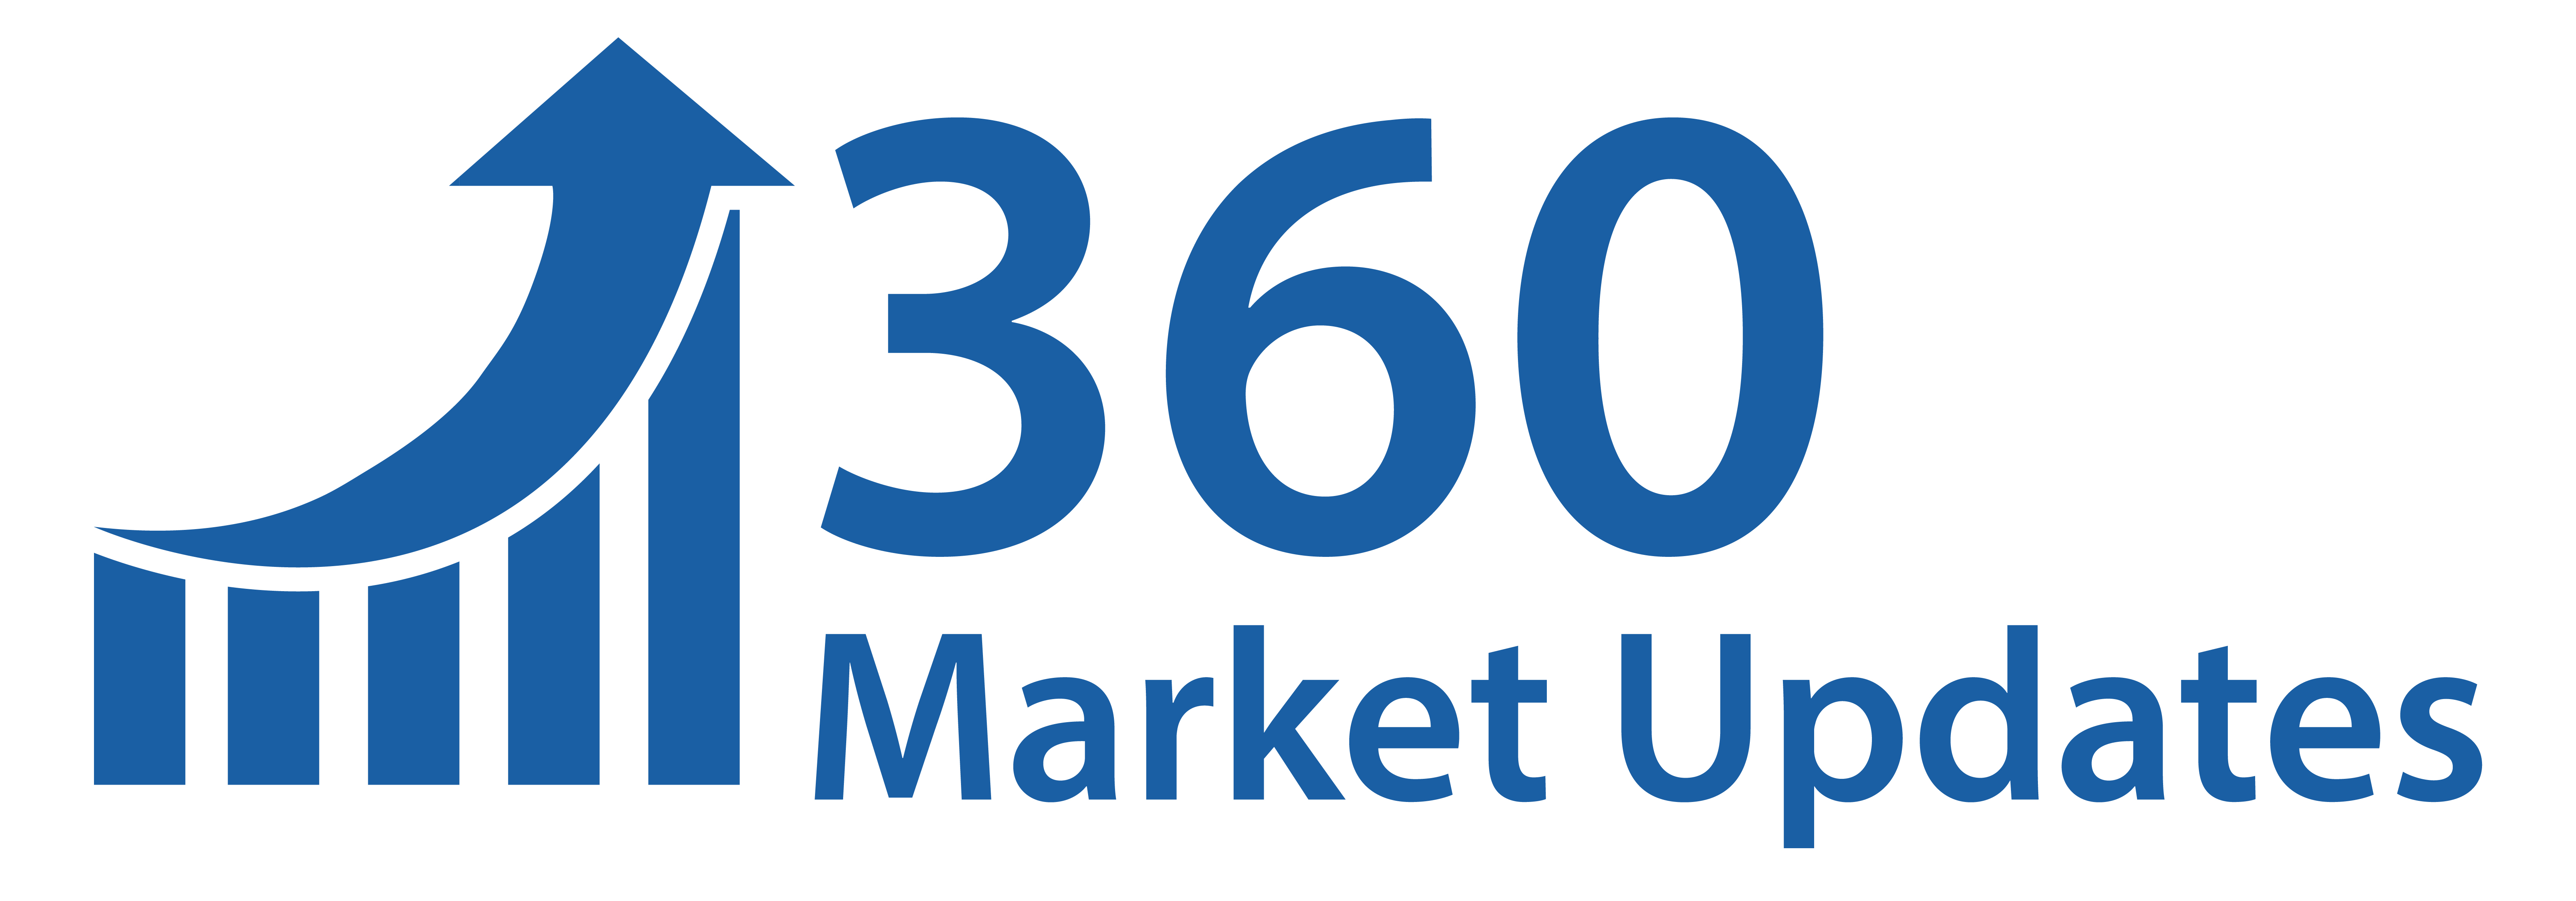 Atherosklerose Therapeutics Market Key Players In Global Region Mit Marktanteil in Pharma, Biotechnologie & Life Sciences,PharmaSektor Projektion bis 2023